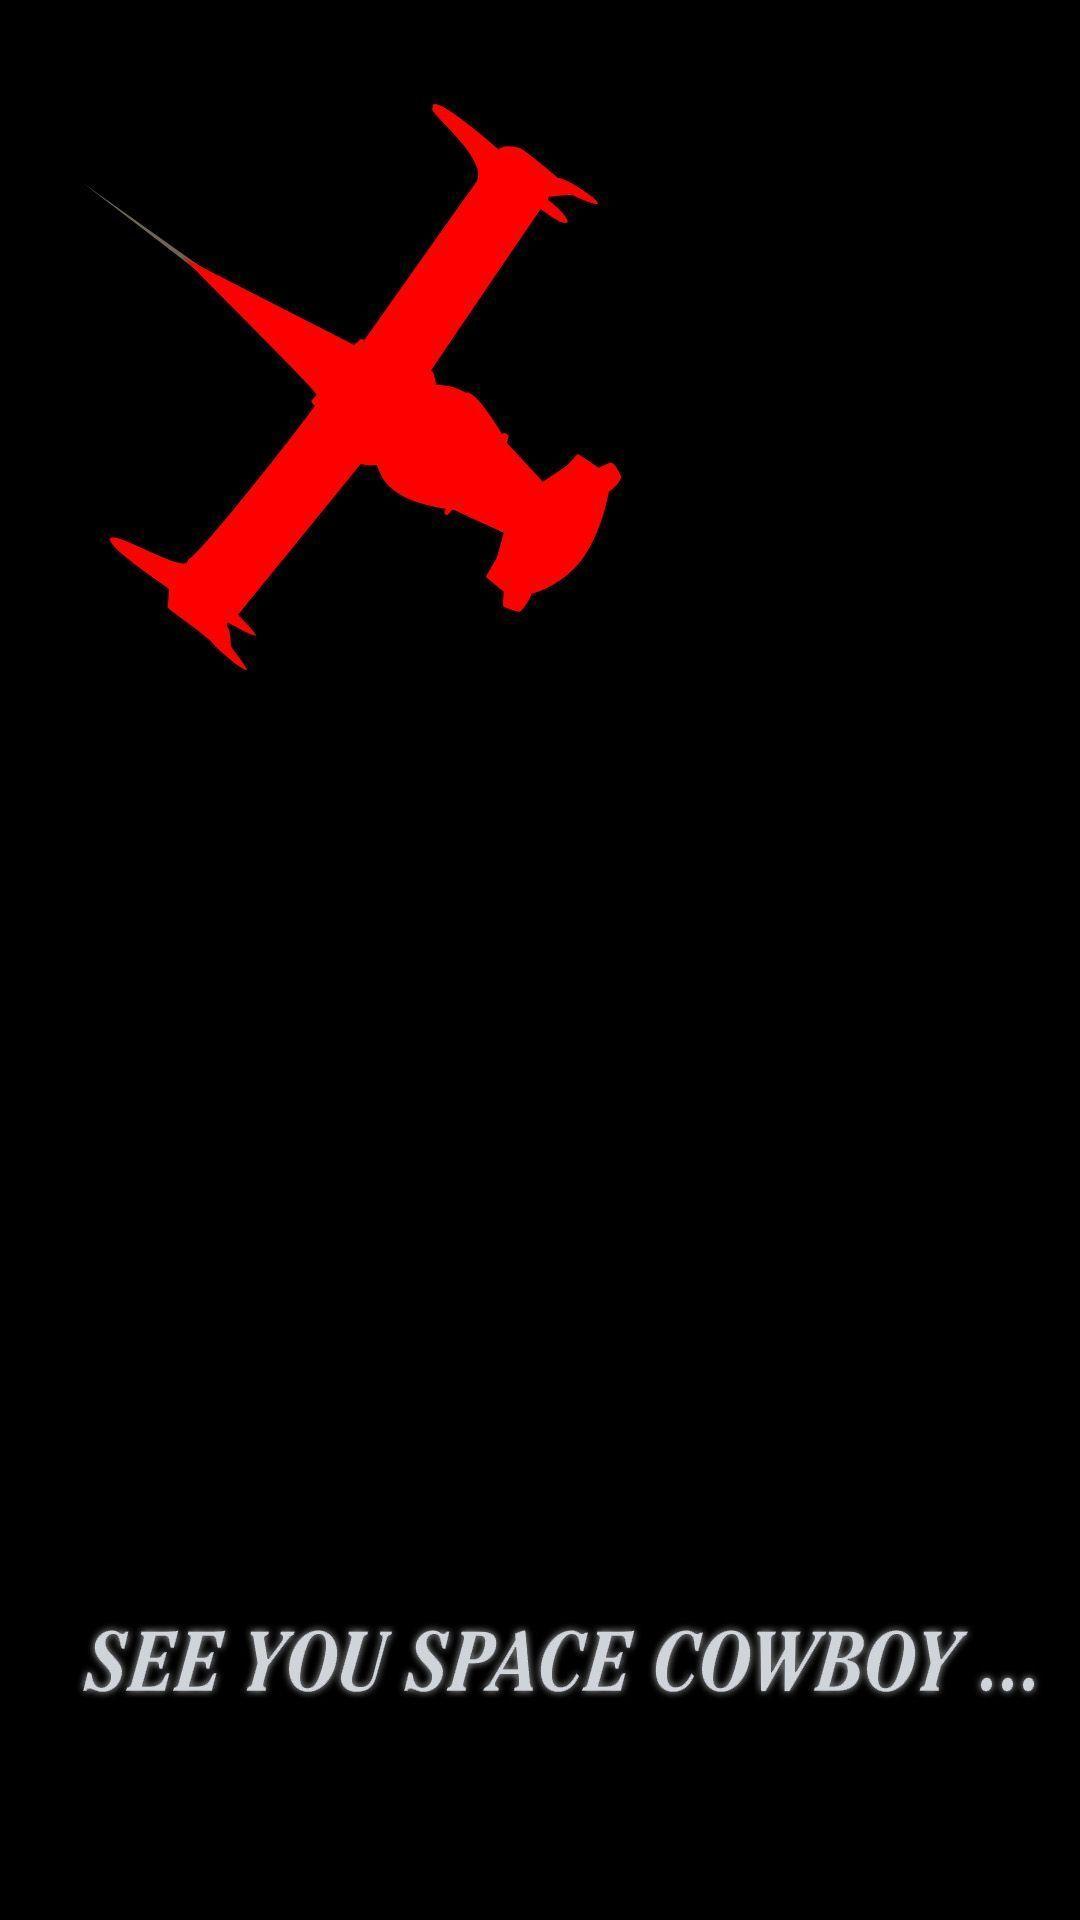 Cowboy Bebop Cell Phone Wallpapers Top Free Cowboy Bebop Cell